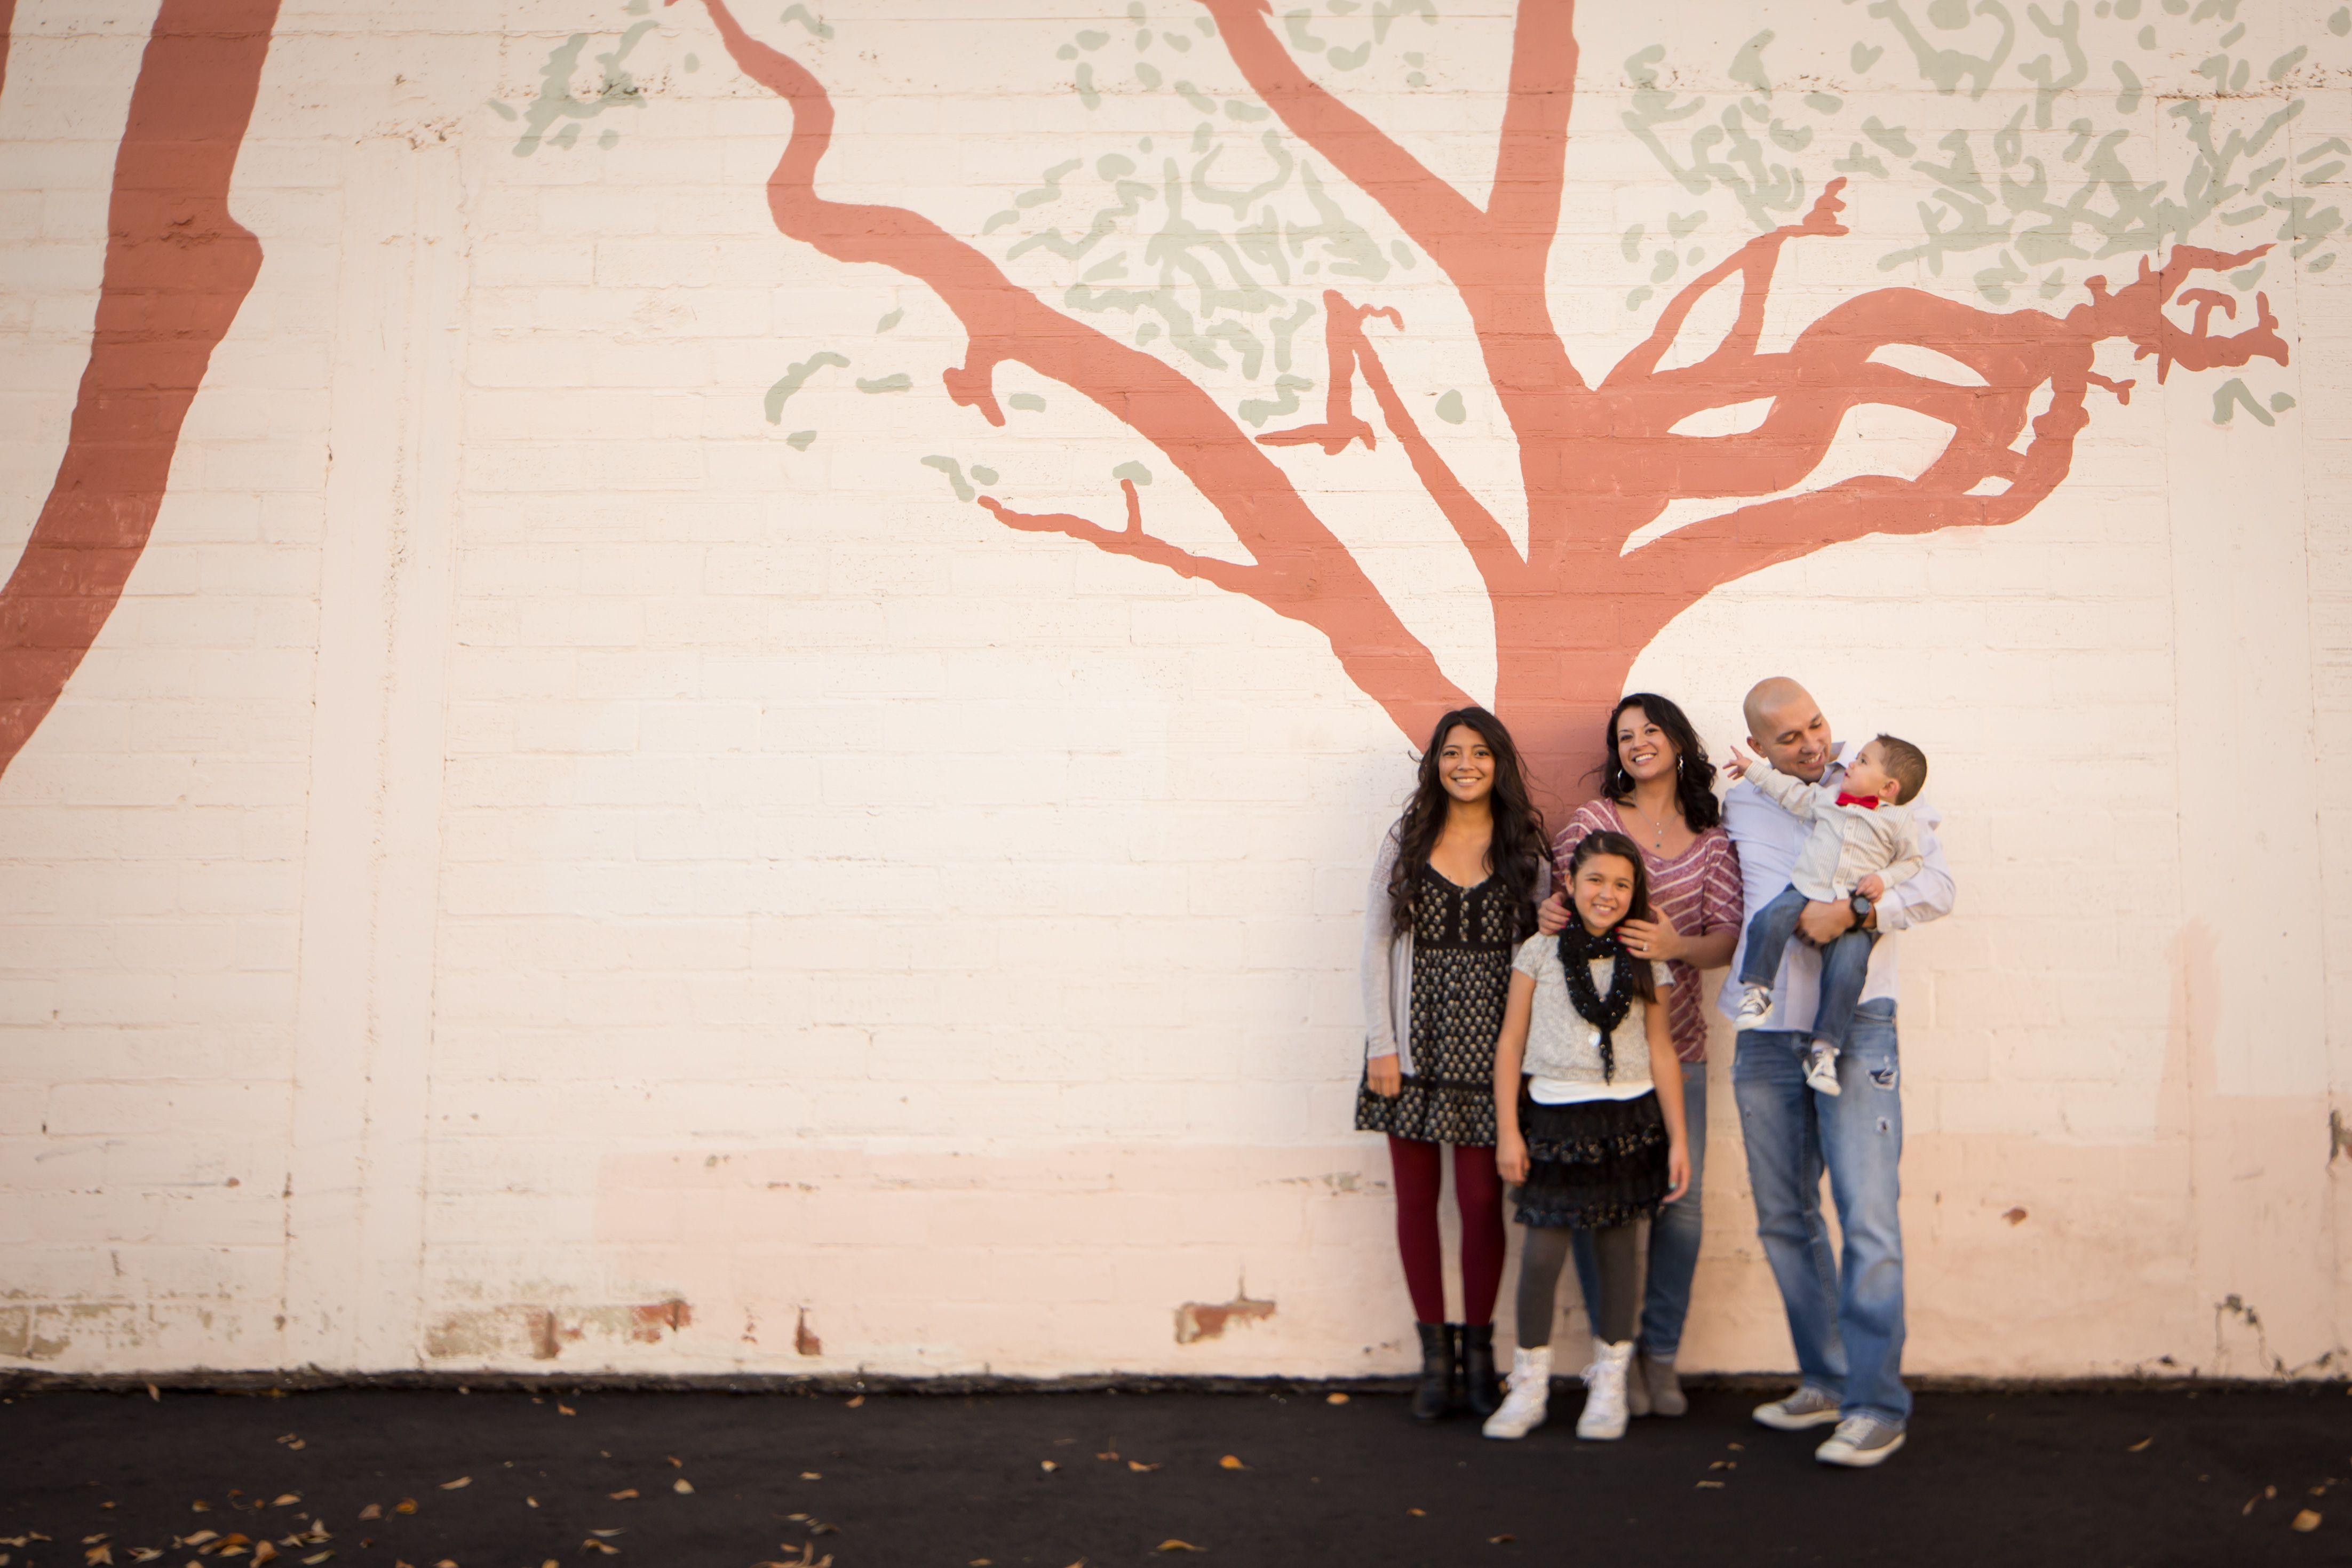 Family photo session in Downtown Albuquerque. Matt Blasing Photography. Albuquerque, New Mexico based Family Photographer. www.mattblasing.com